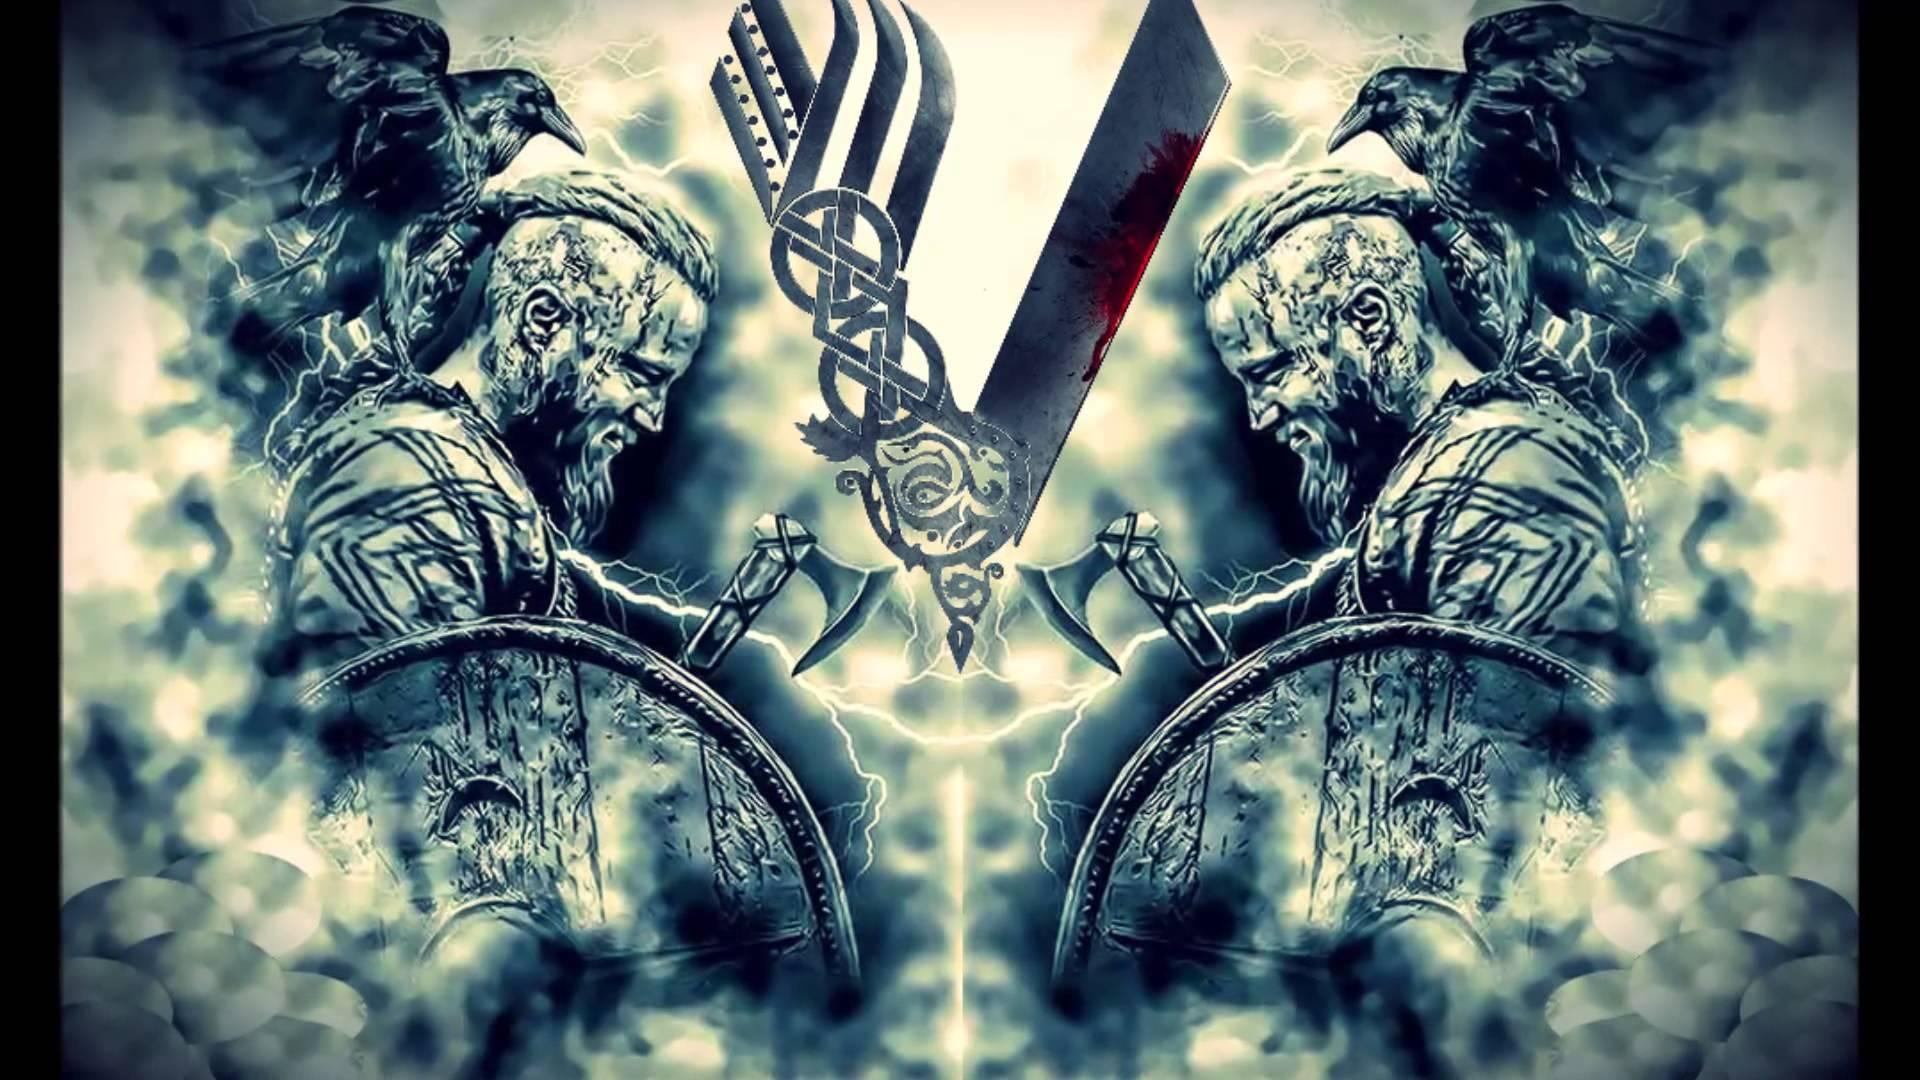 Vikings Wardruna ~ Ragnar Lodbrok (Soundtrack HD ) 2015 - YouTube